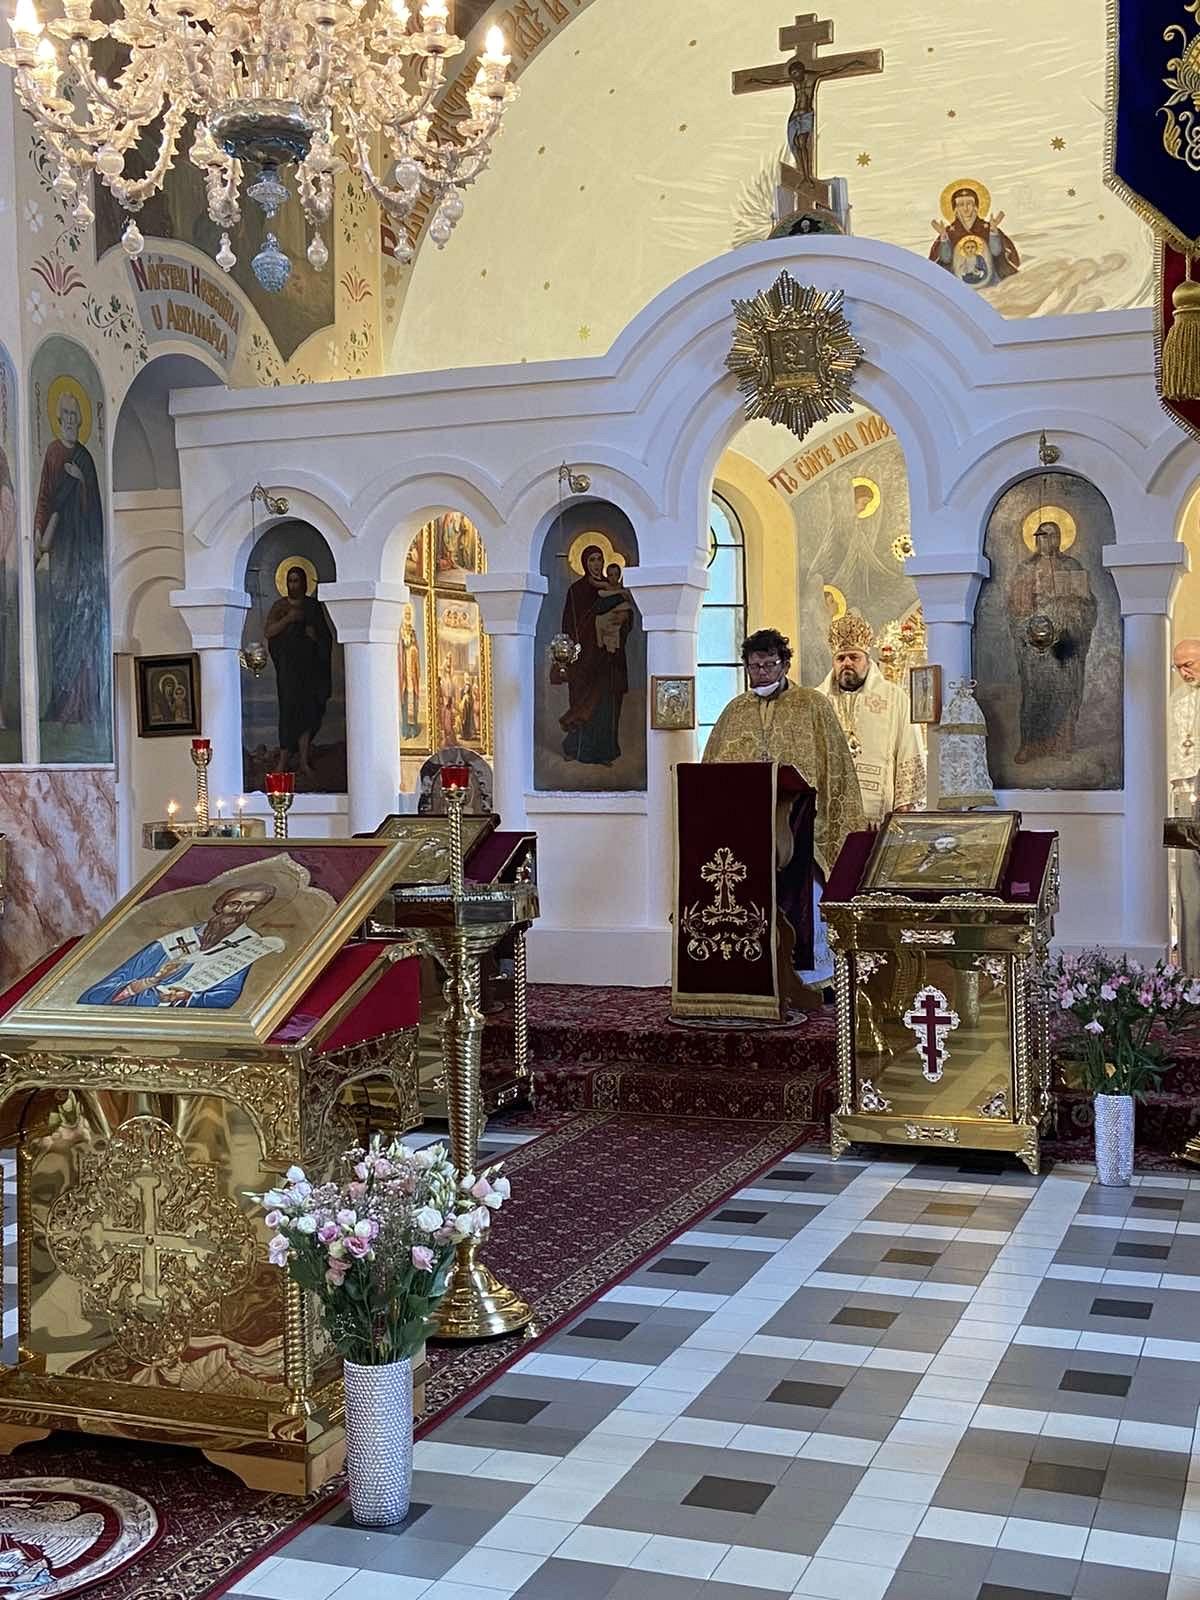 2021-06-01-presbyterium-liturgie-50-F3858975-C493-49A1-9D8D-CC7591F5674C_1